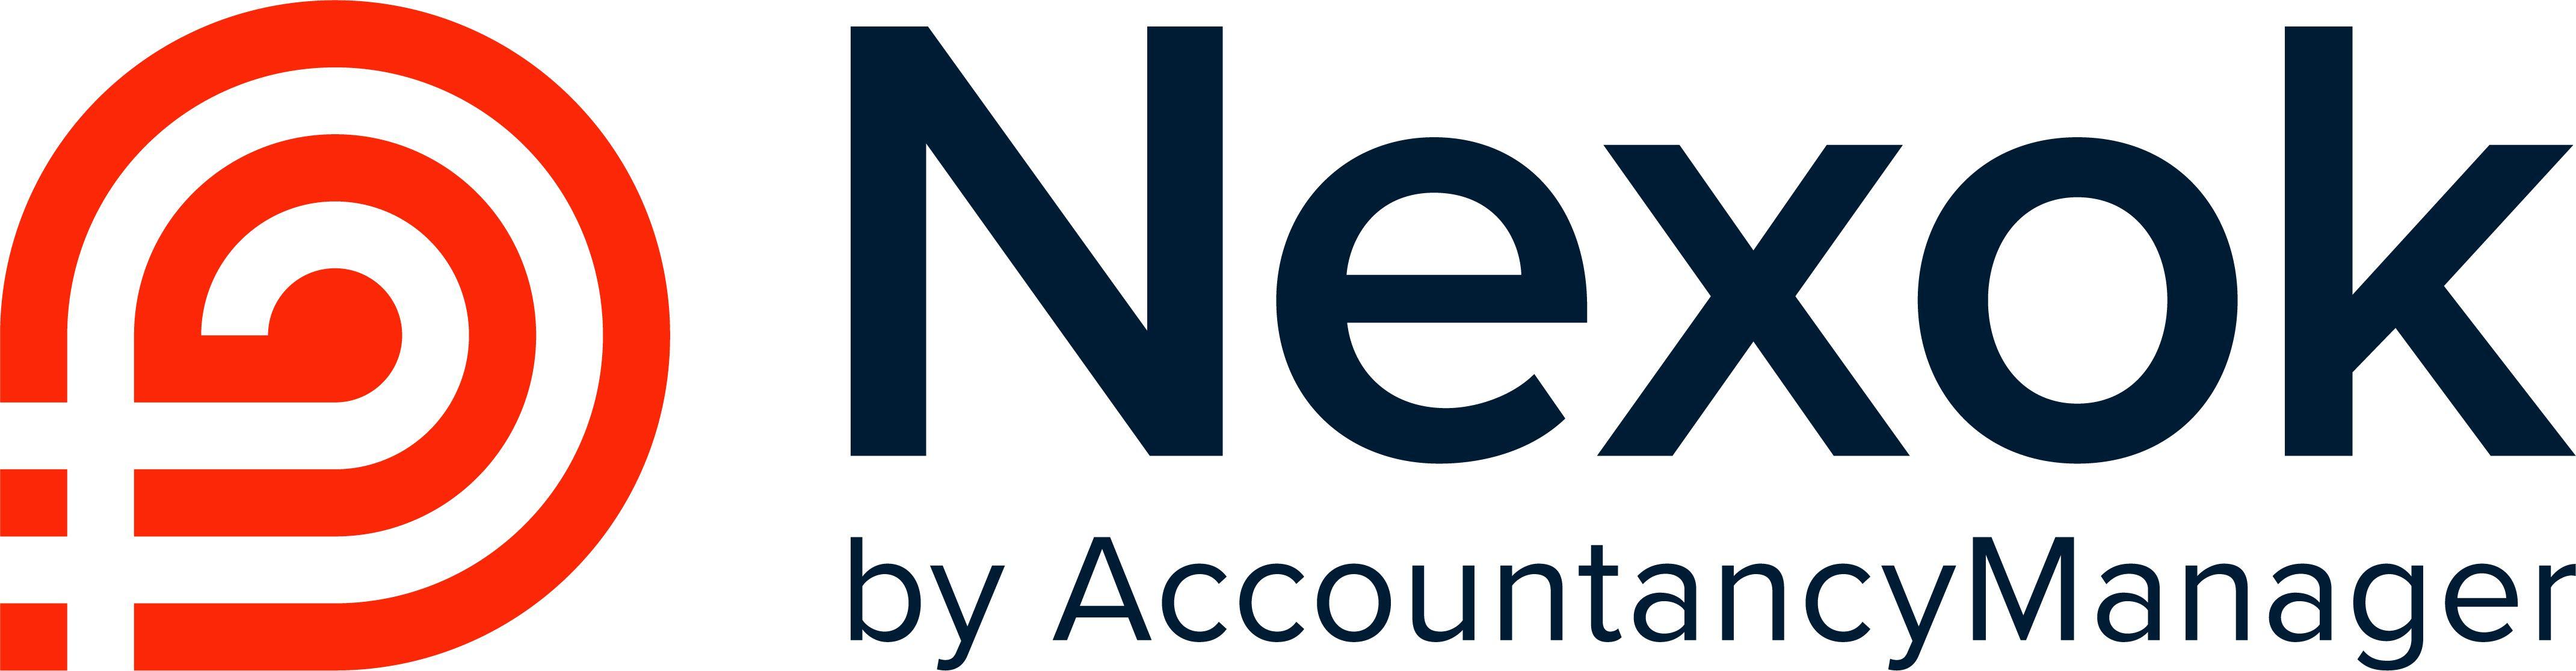 AccountancyManager